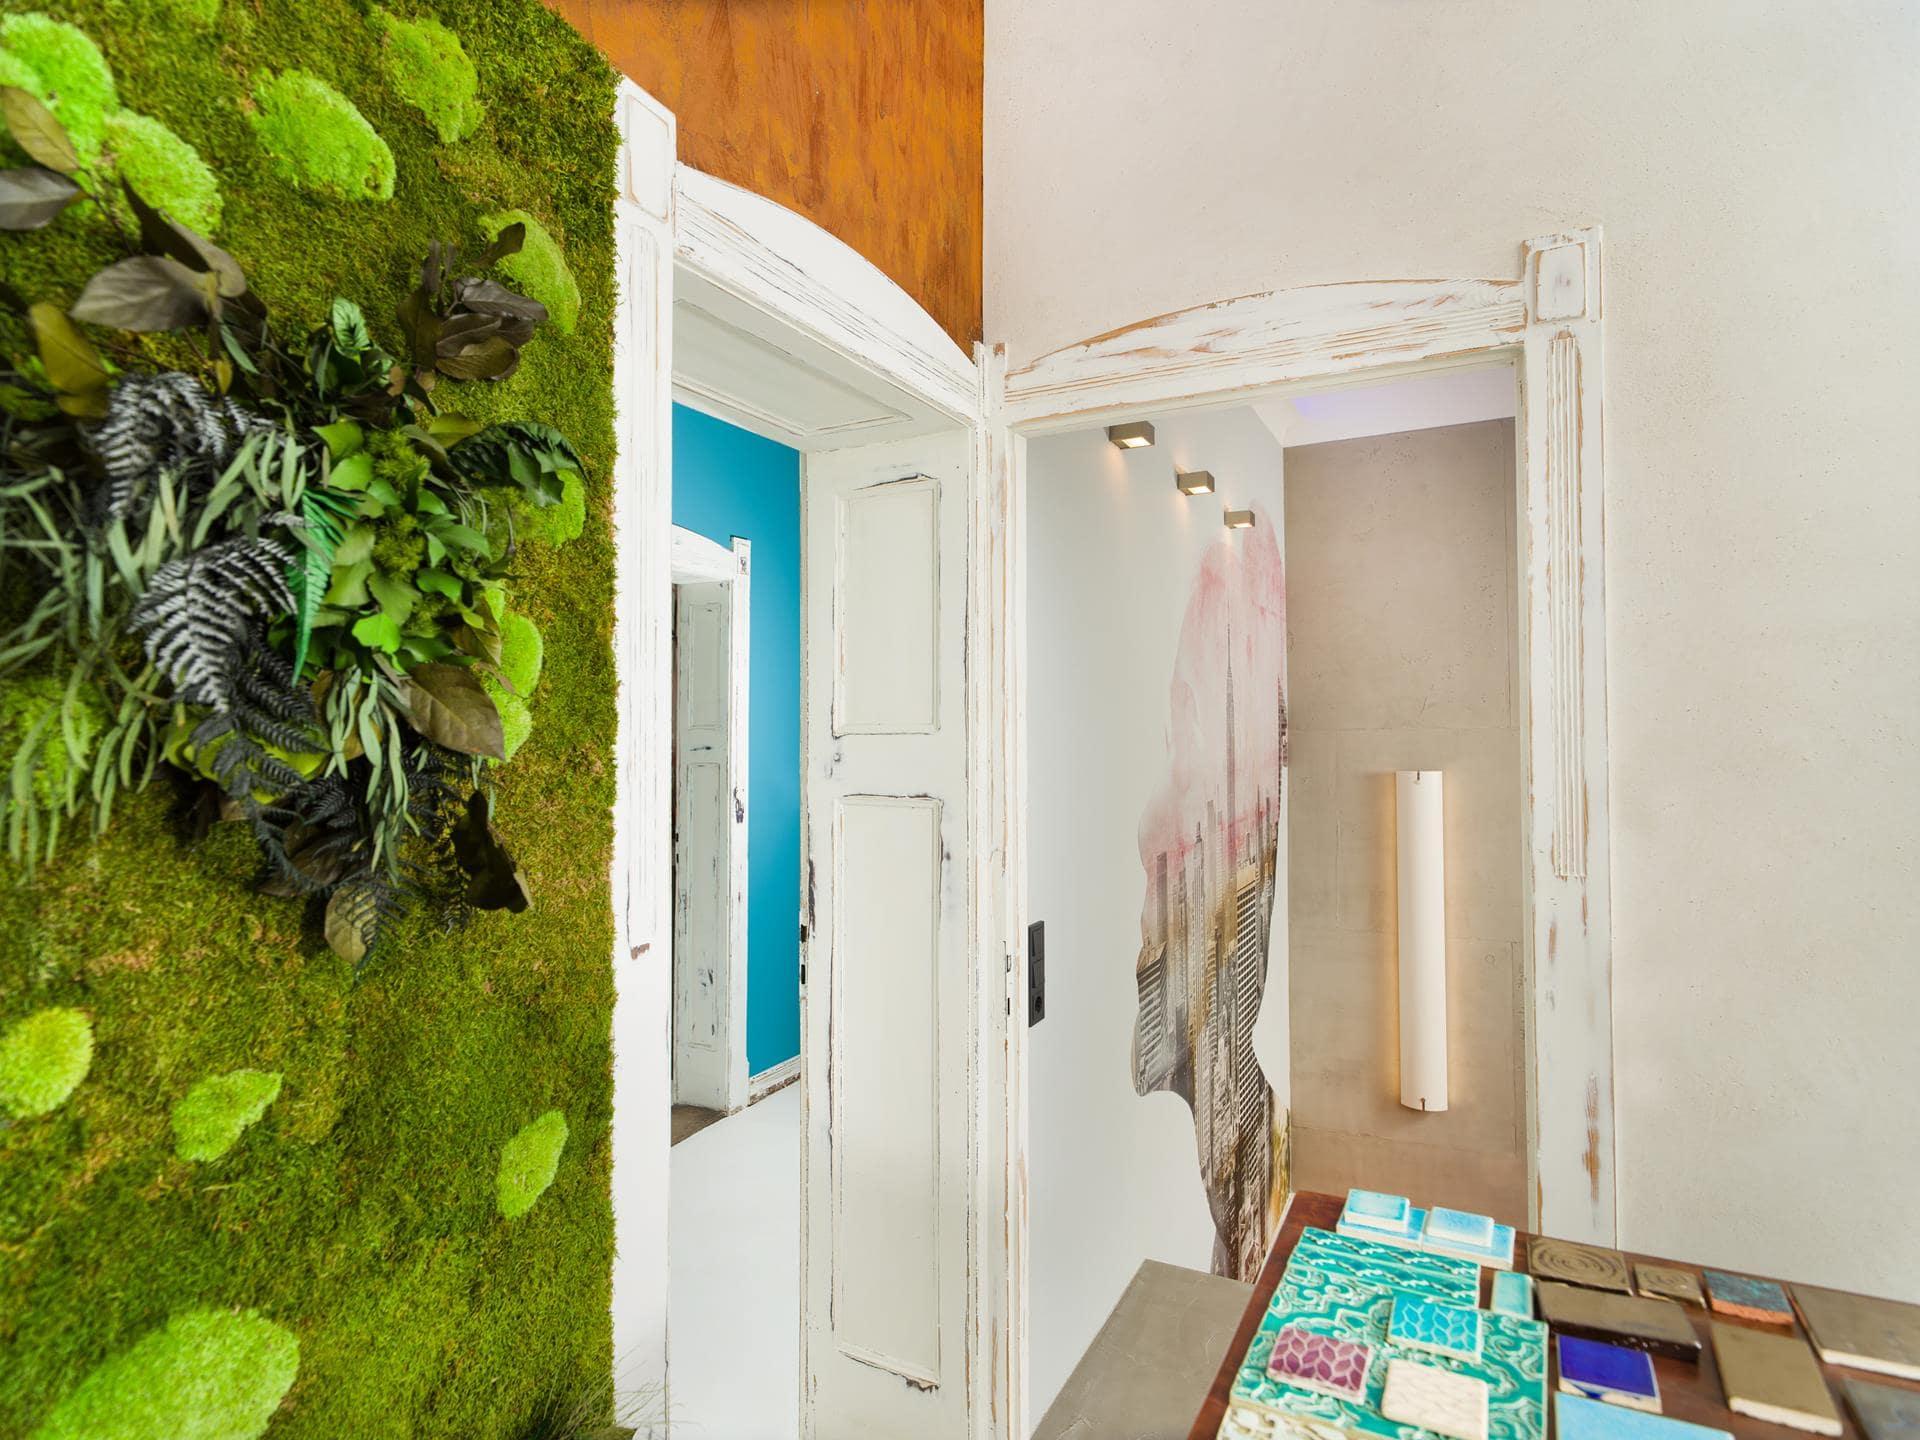 Ausstellung-Showroom-bad-glamora-spachtelboden-betonoptik-fugenlos-gestaltungsmaler-spohn-wiesbaden-05